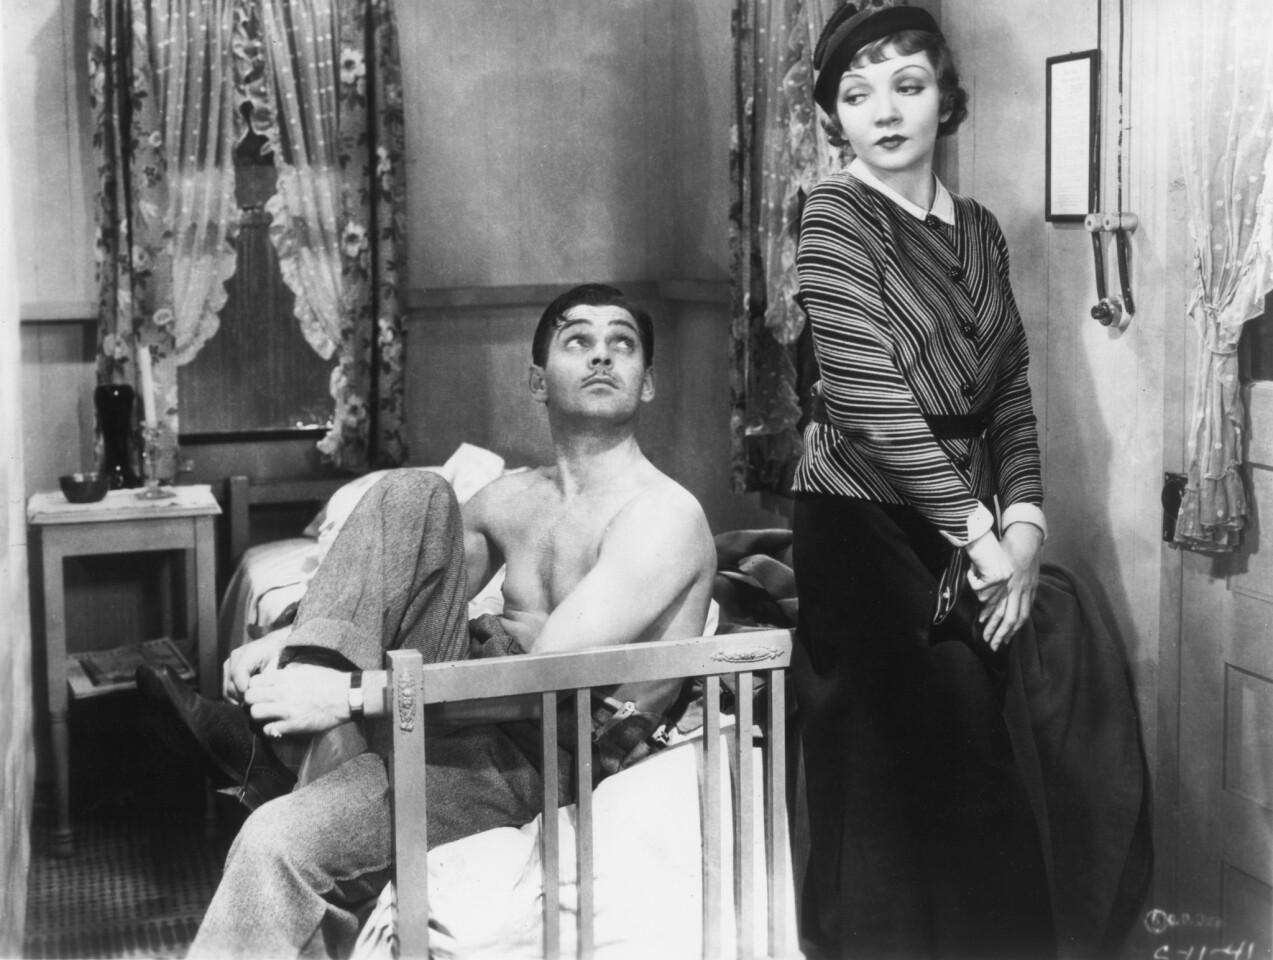 RomCom 101 | 'It Happened One Night' (1934)